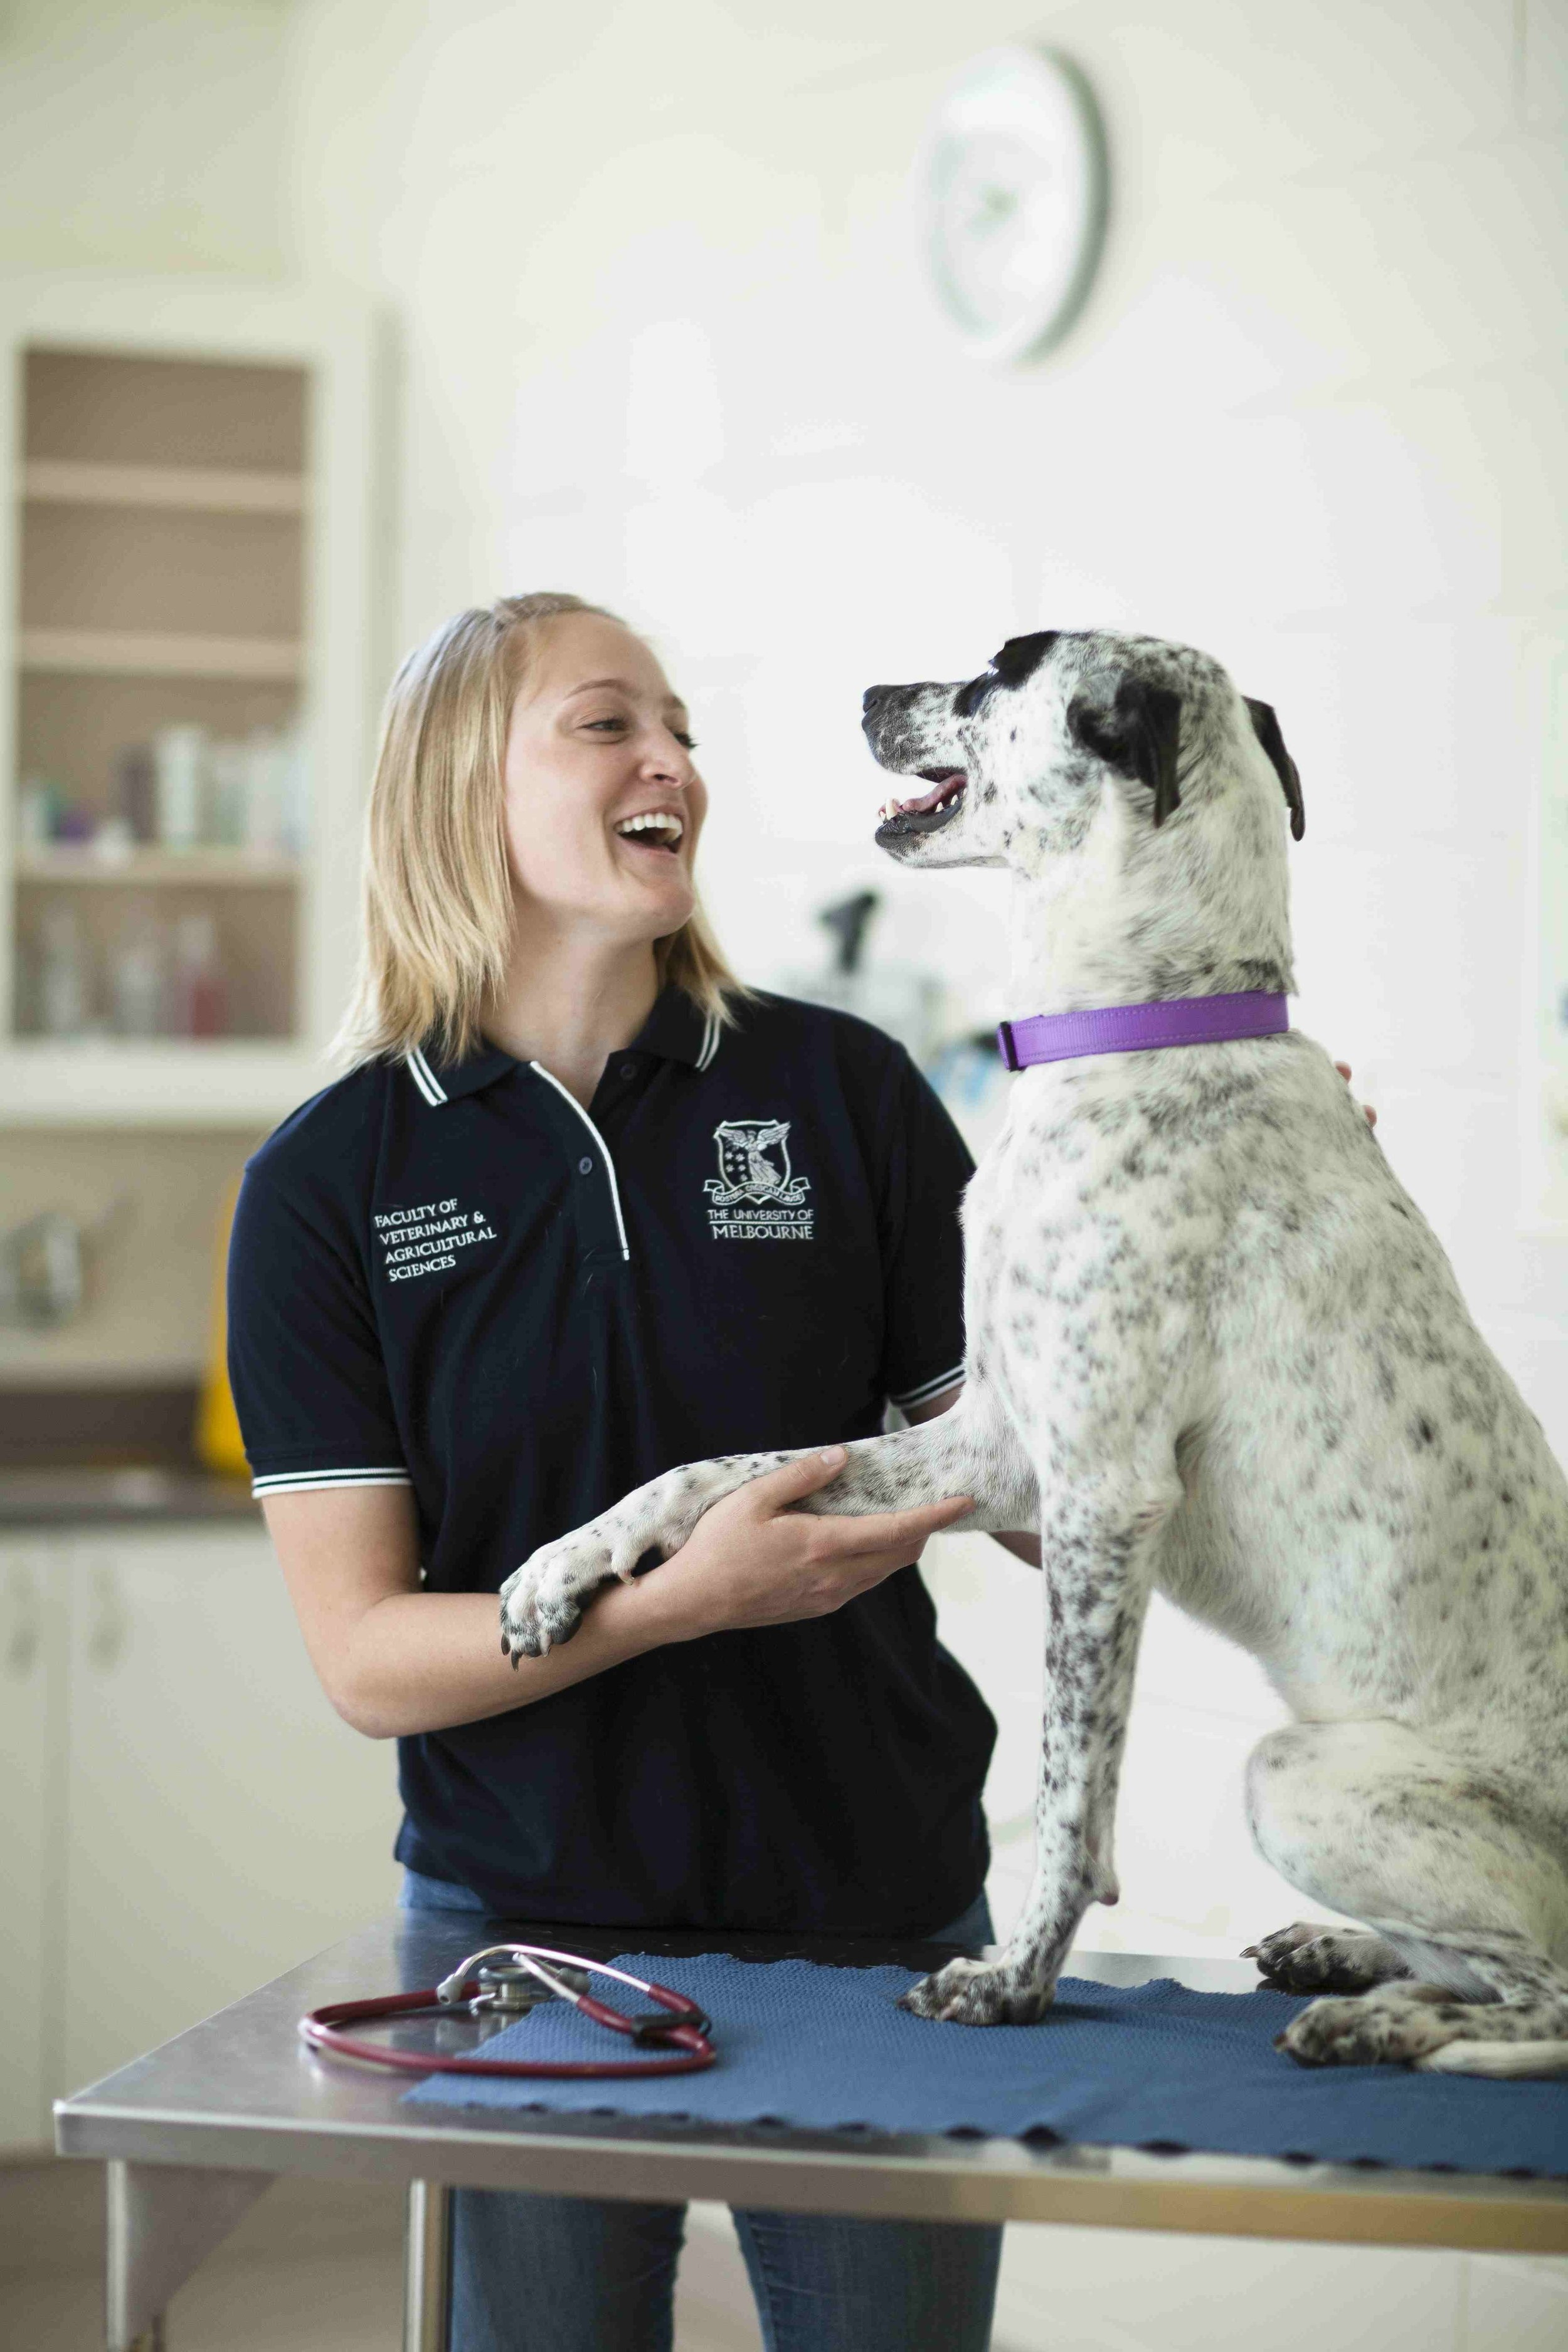 Melbourne university Veterinary Sciences